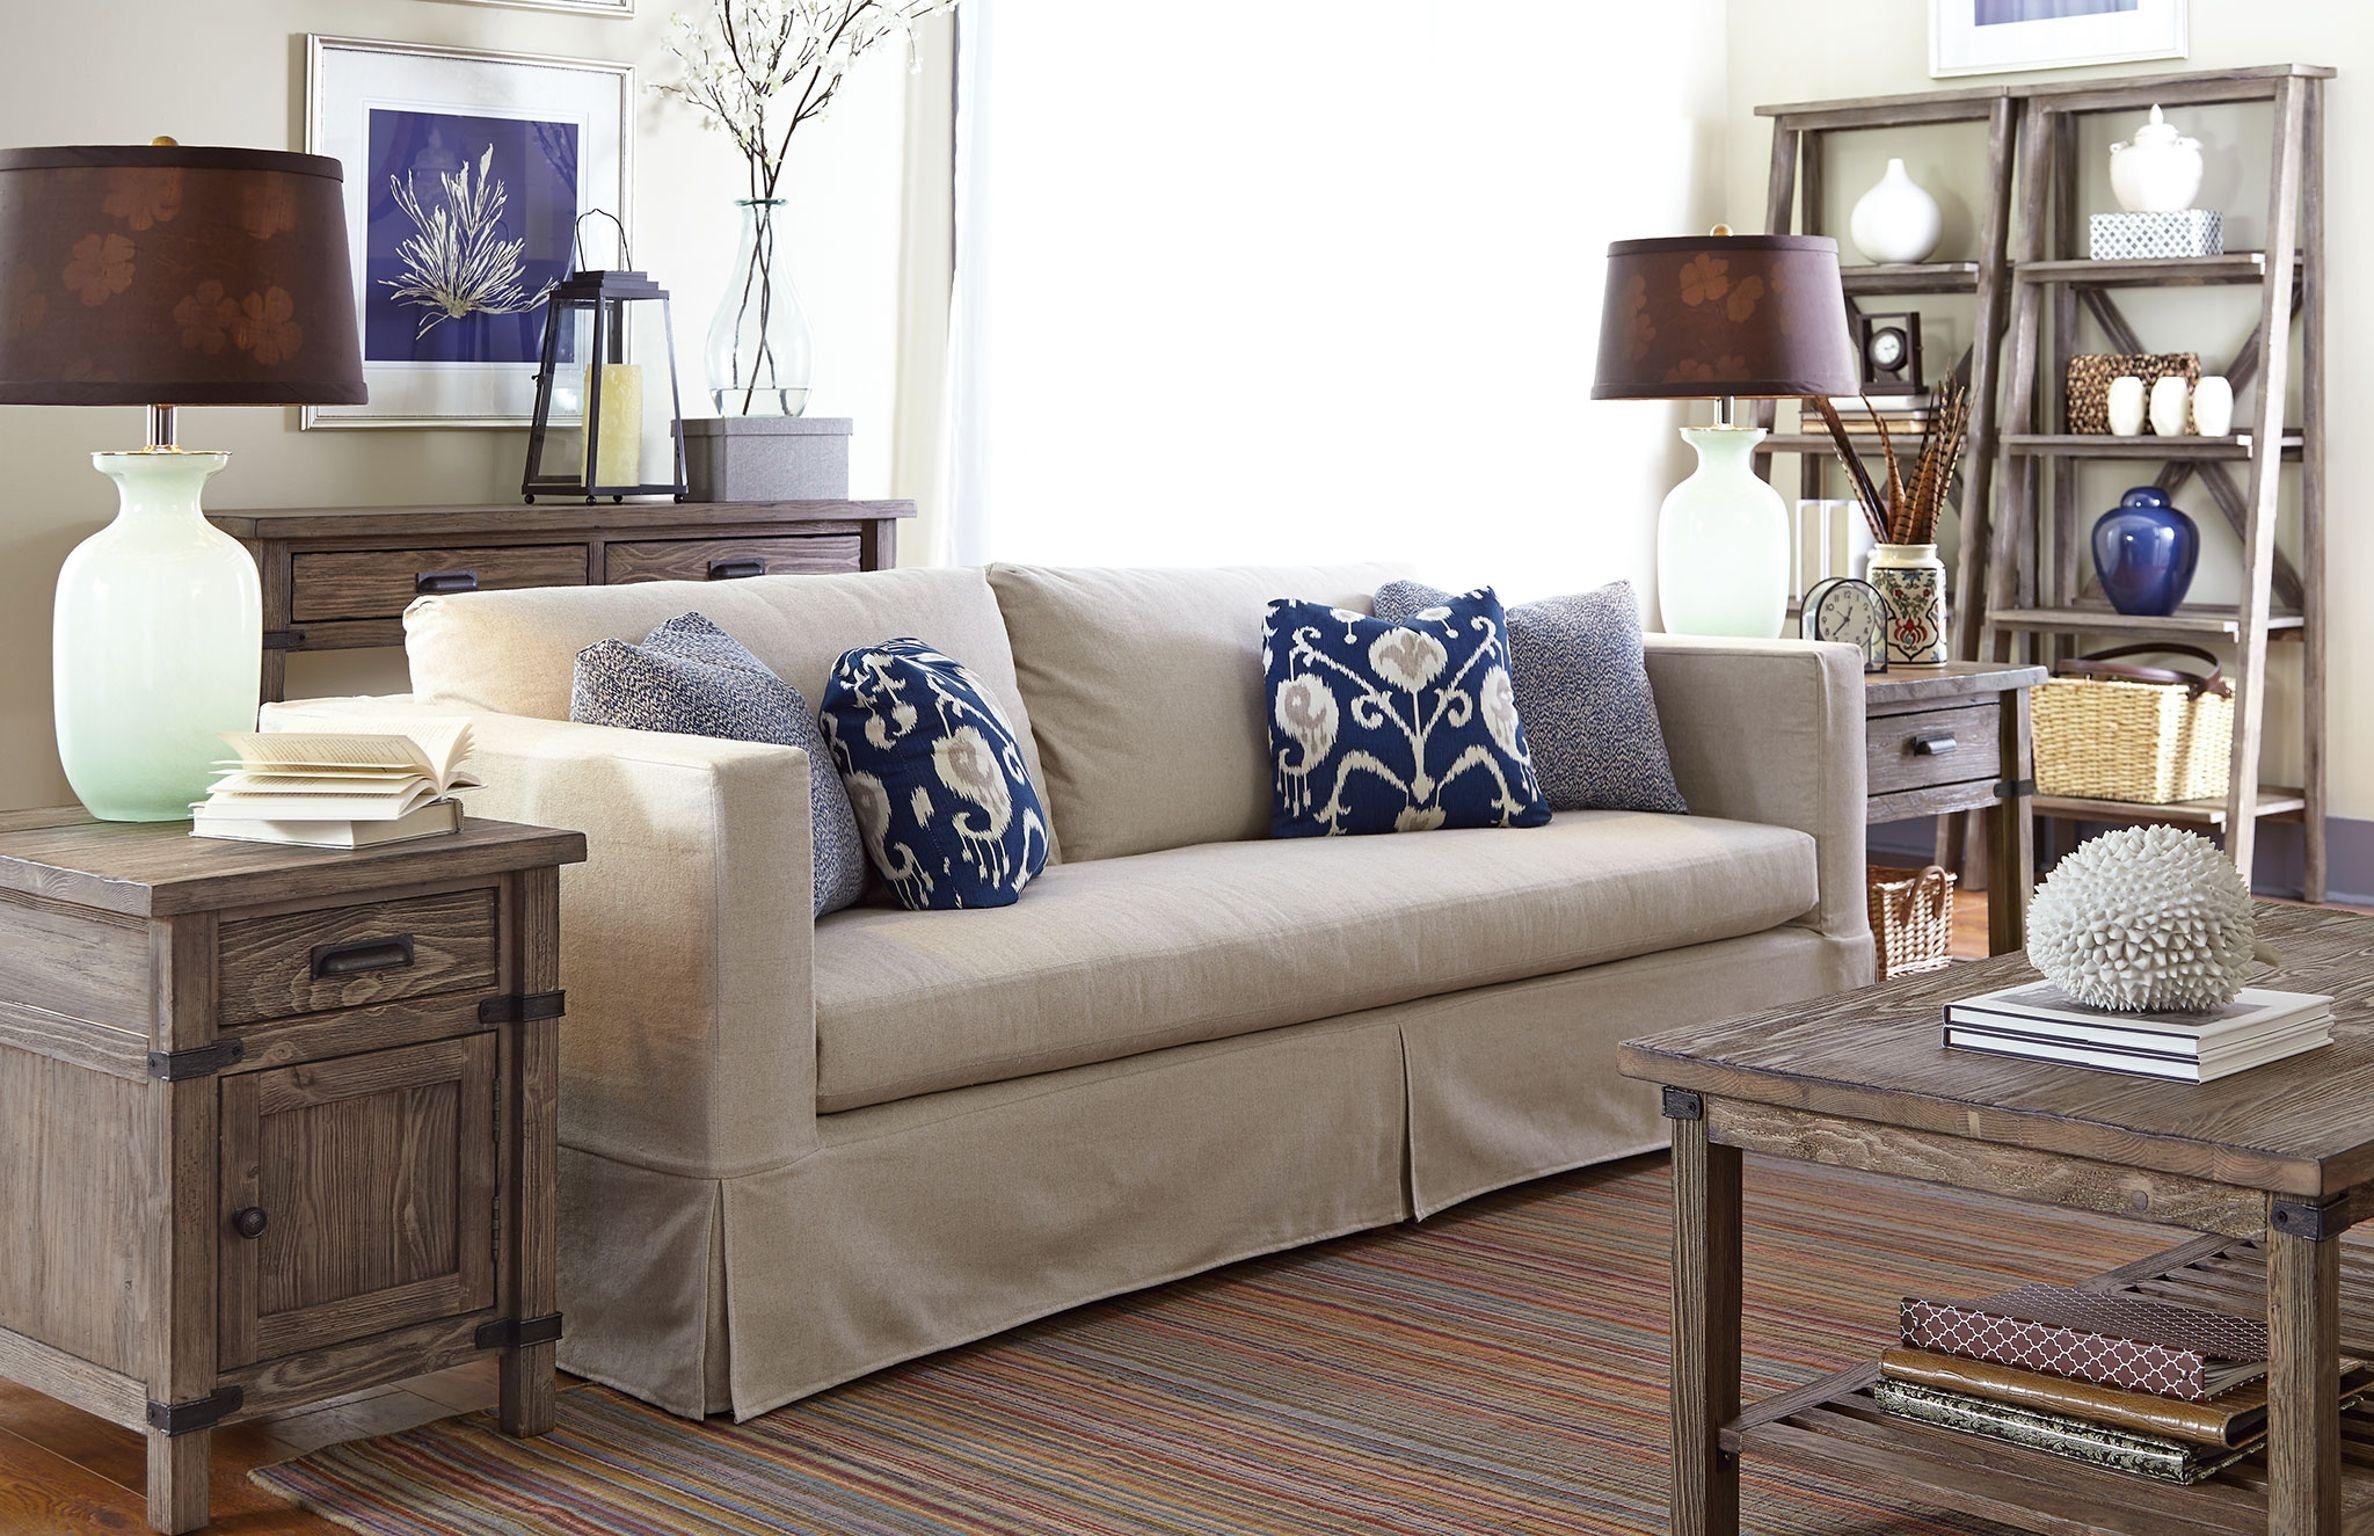 Kincaid Furniture Chairside Table 59 026